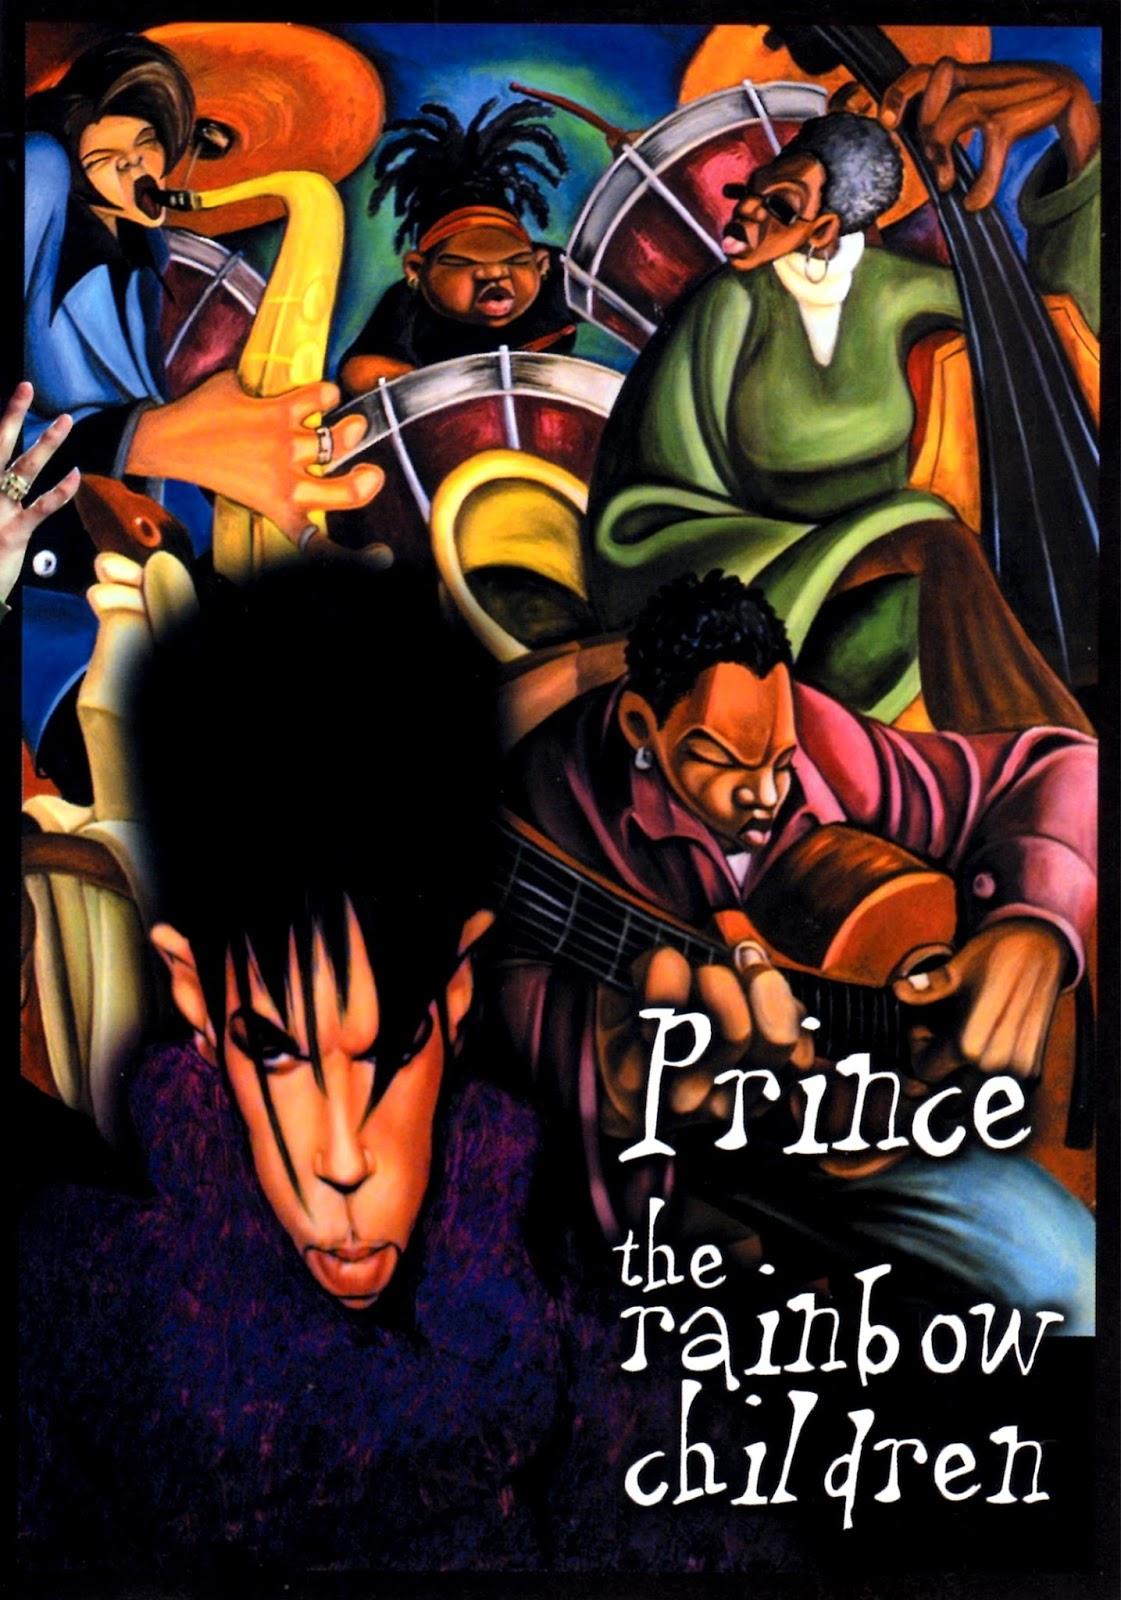 Prince NPG Press Photos (The Rainbow Children - 4Ever)